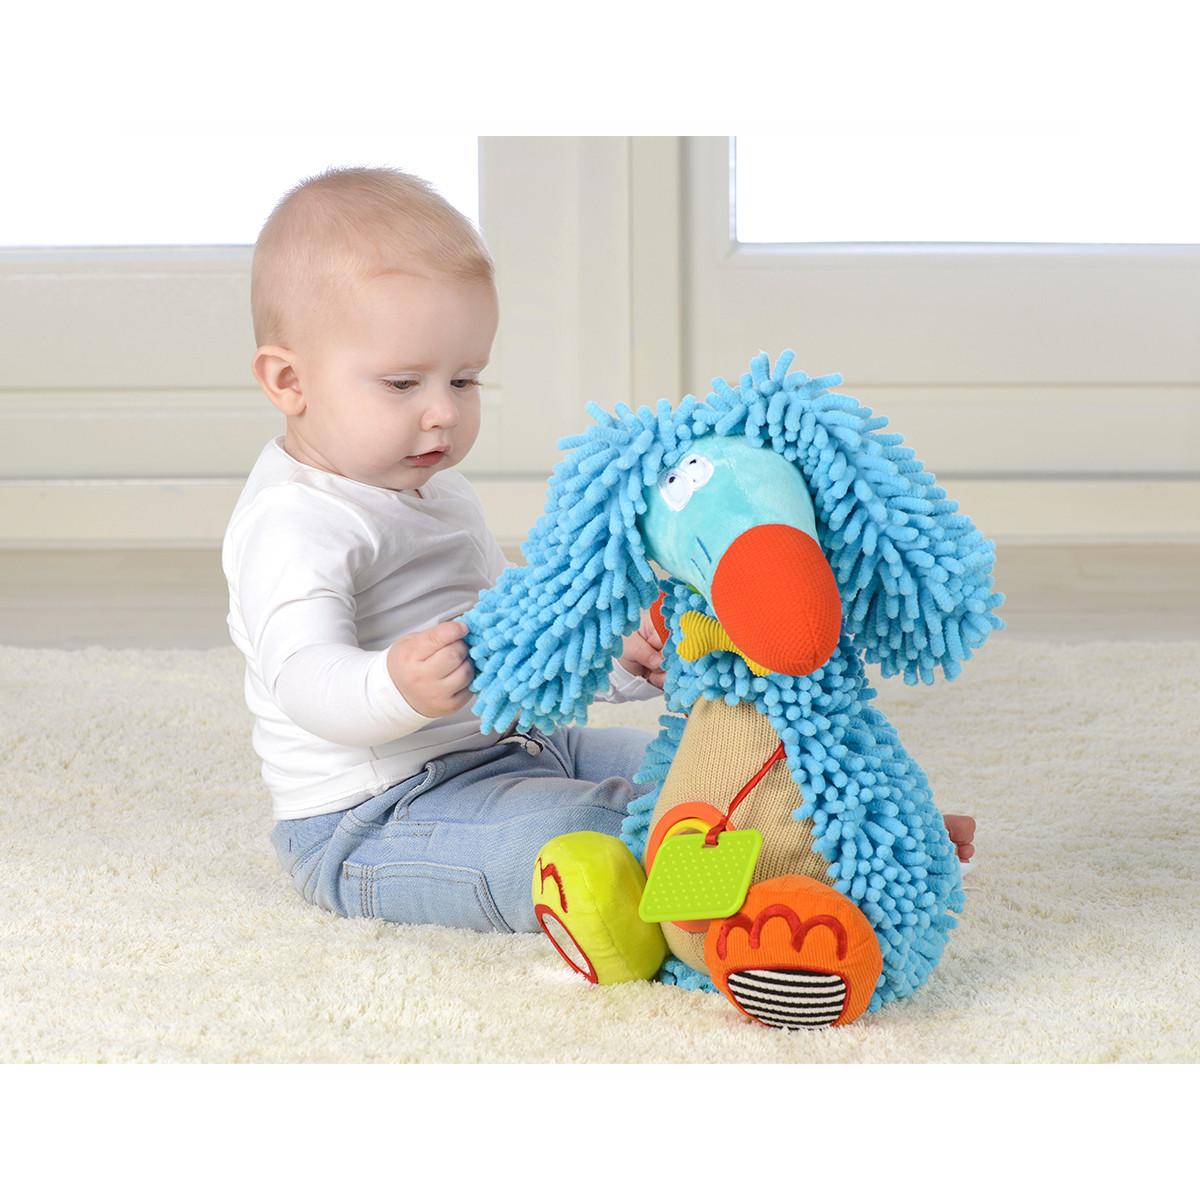 Dolce edukativna igračka - Lovački pas 33cm